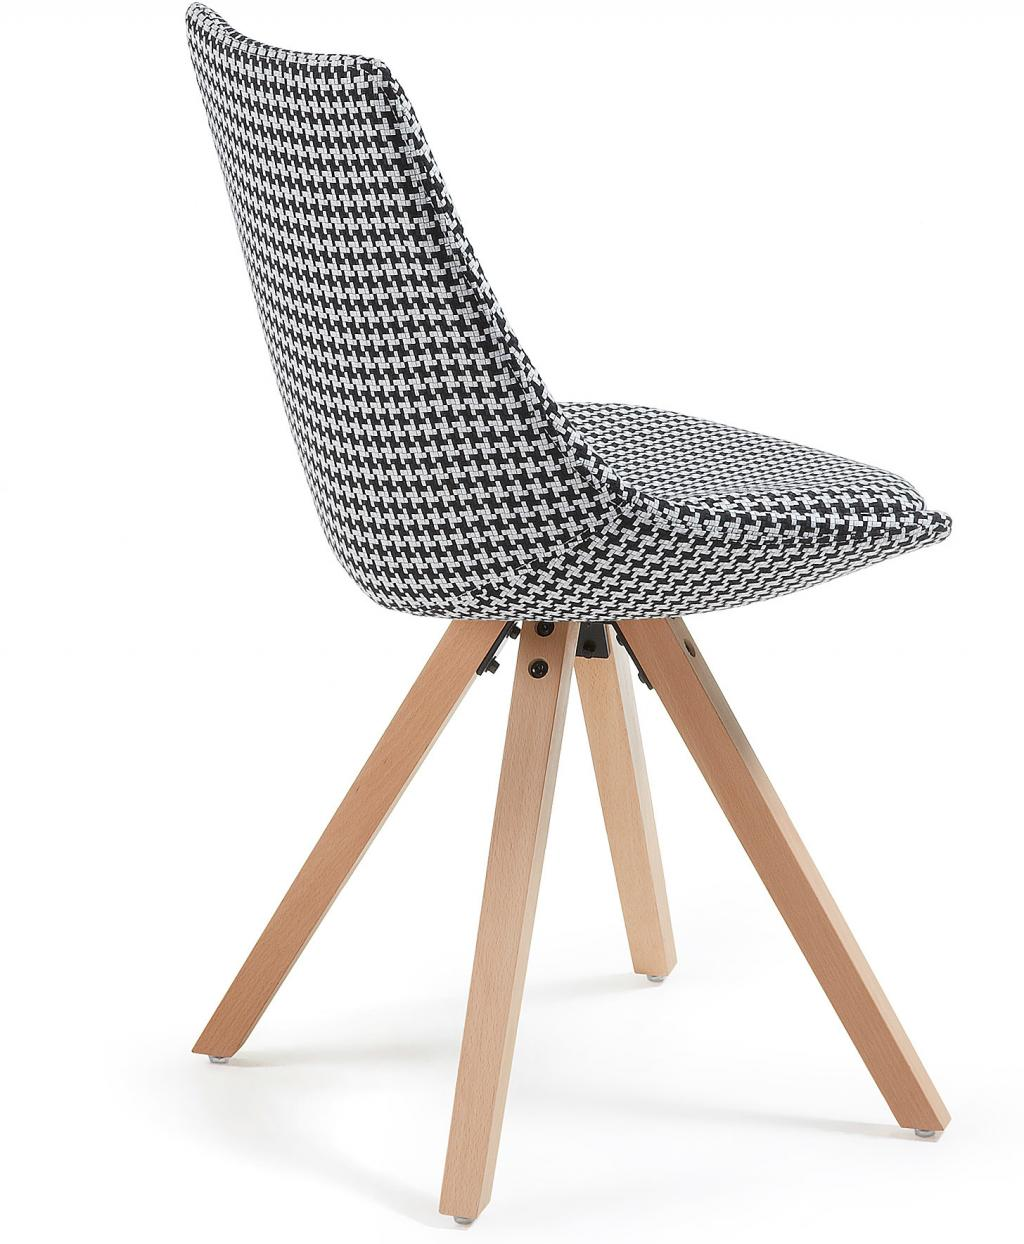 stuhl avenue gepolstert kariert schwarz wei la forma kaufen wohn. Black Bedroom Furniture Sets. Home Design Ideas